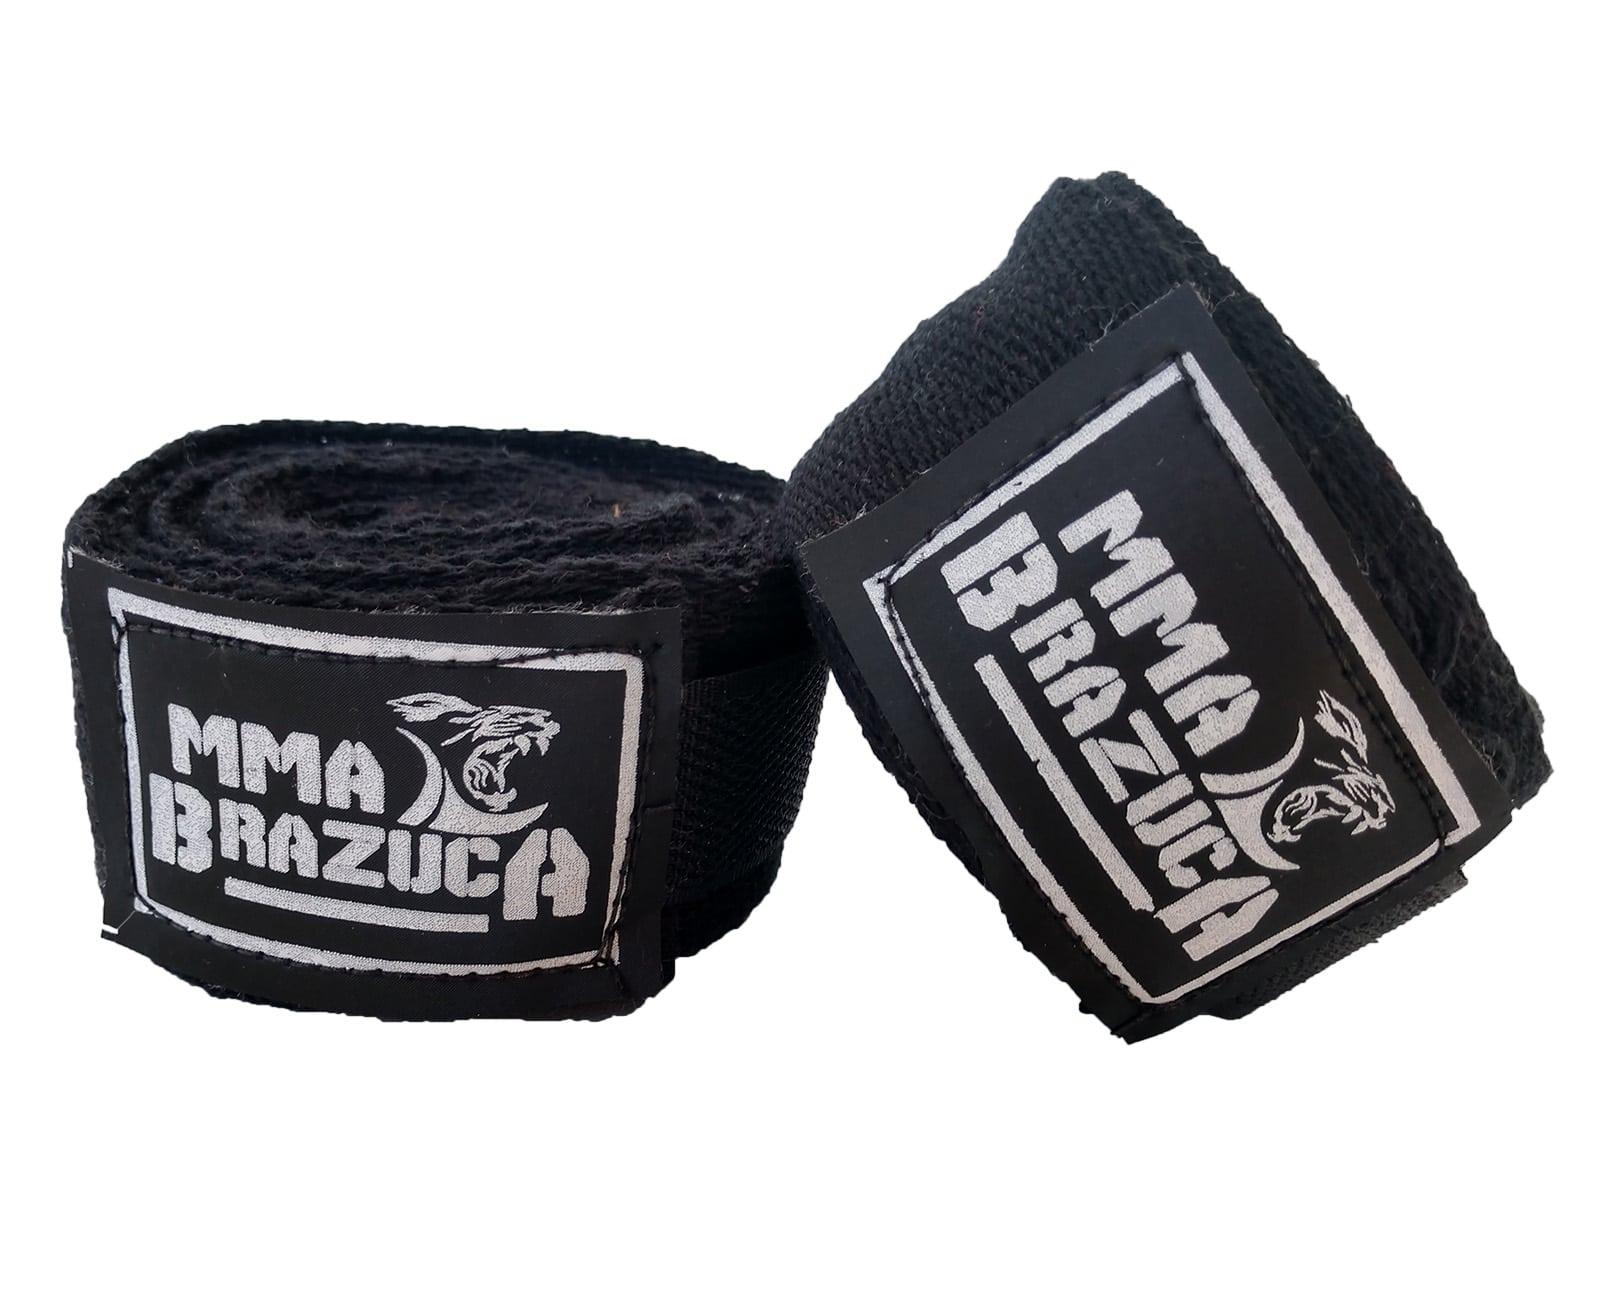 Kit de Boxe / Muay Thai 14oz Feminino - Preto com Rosa - MMA Brazuka  - PRALUTA SHOP